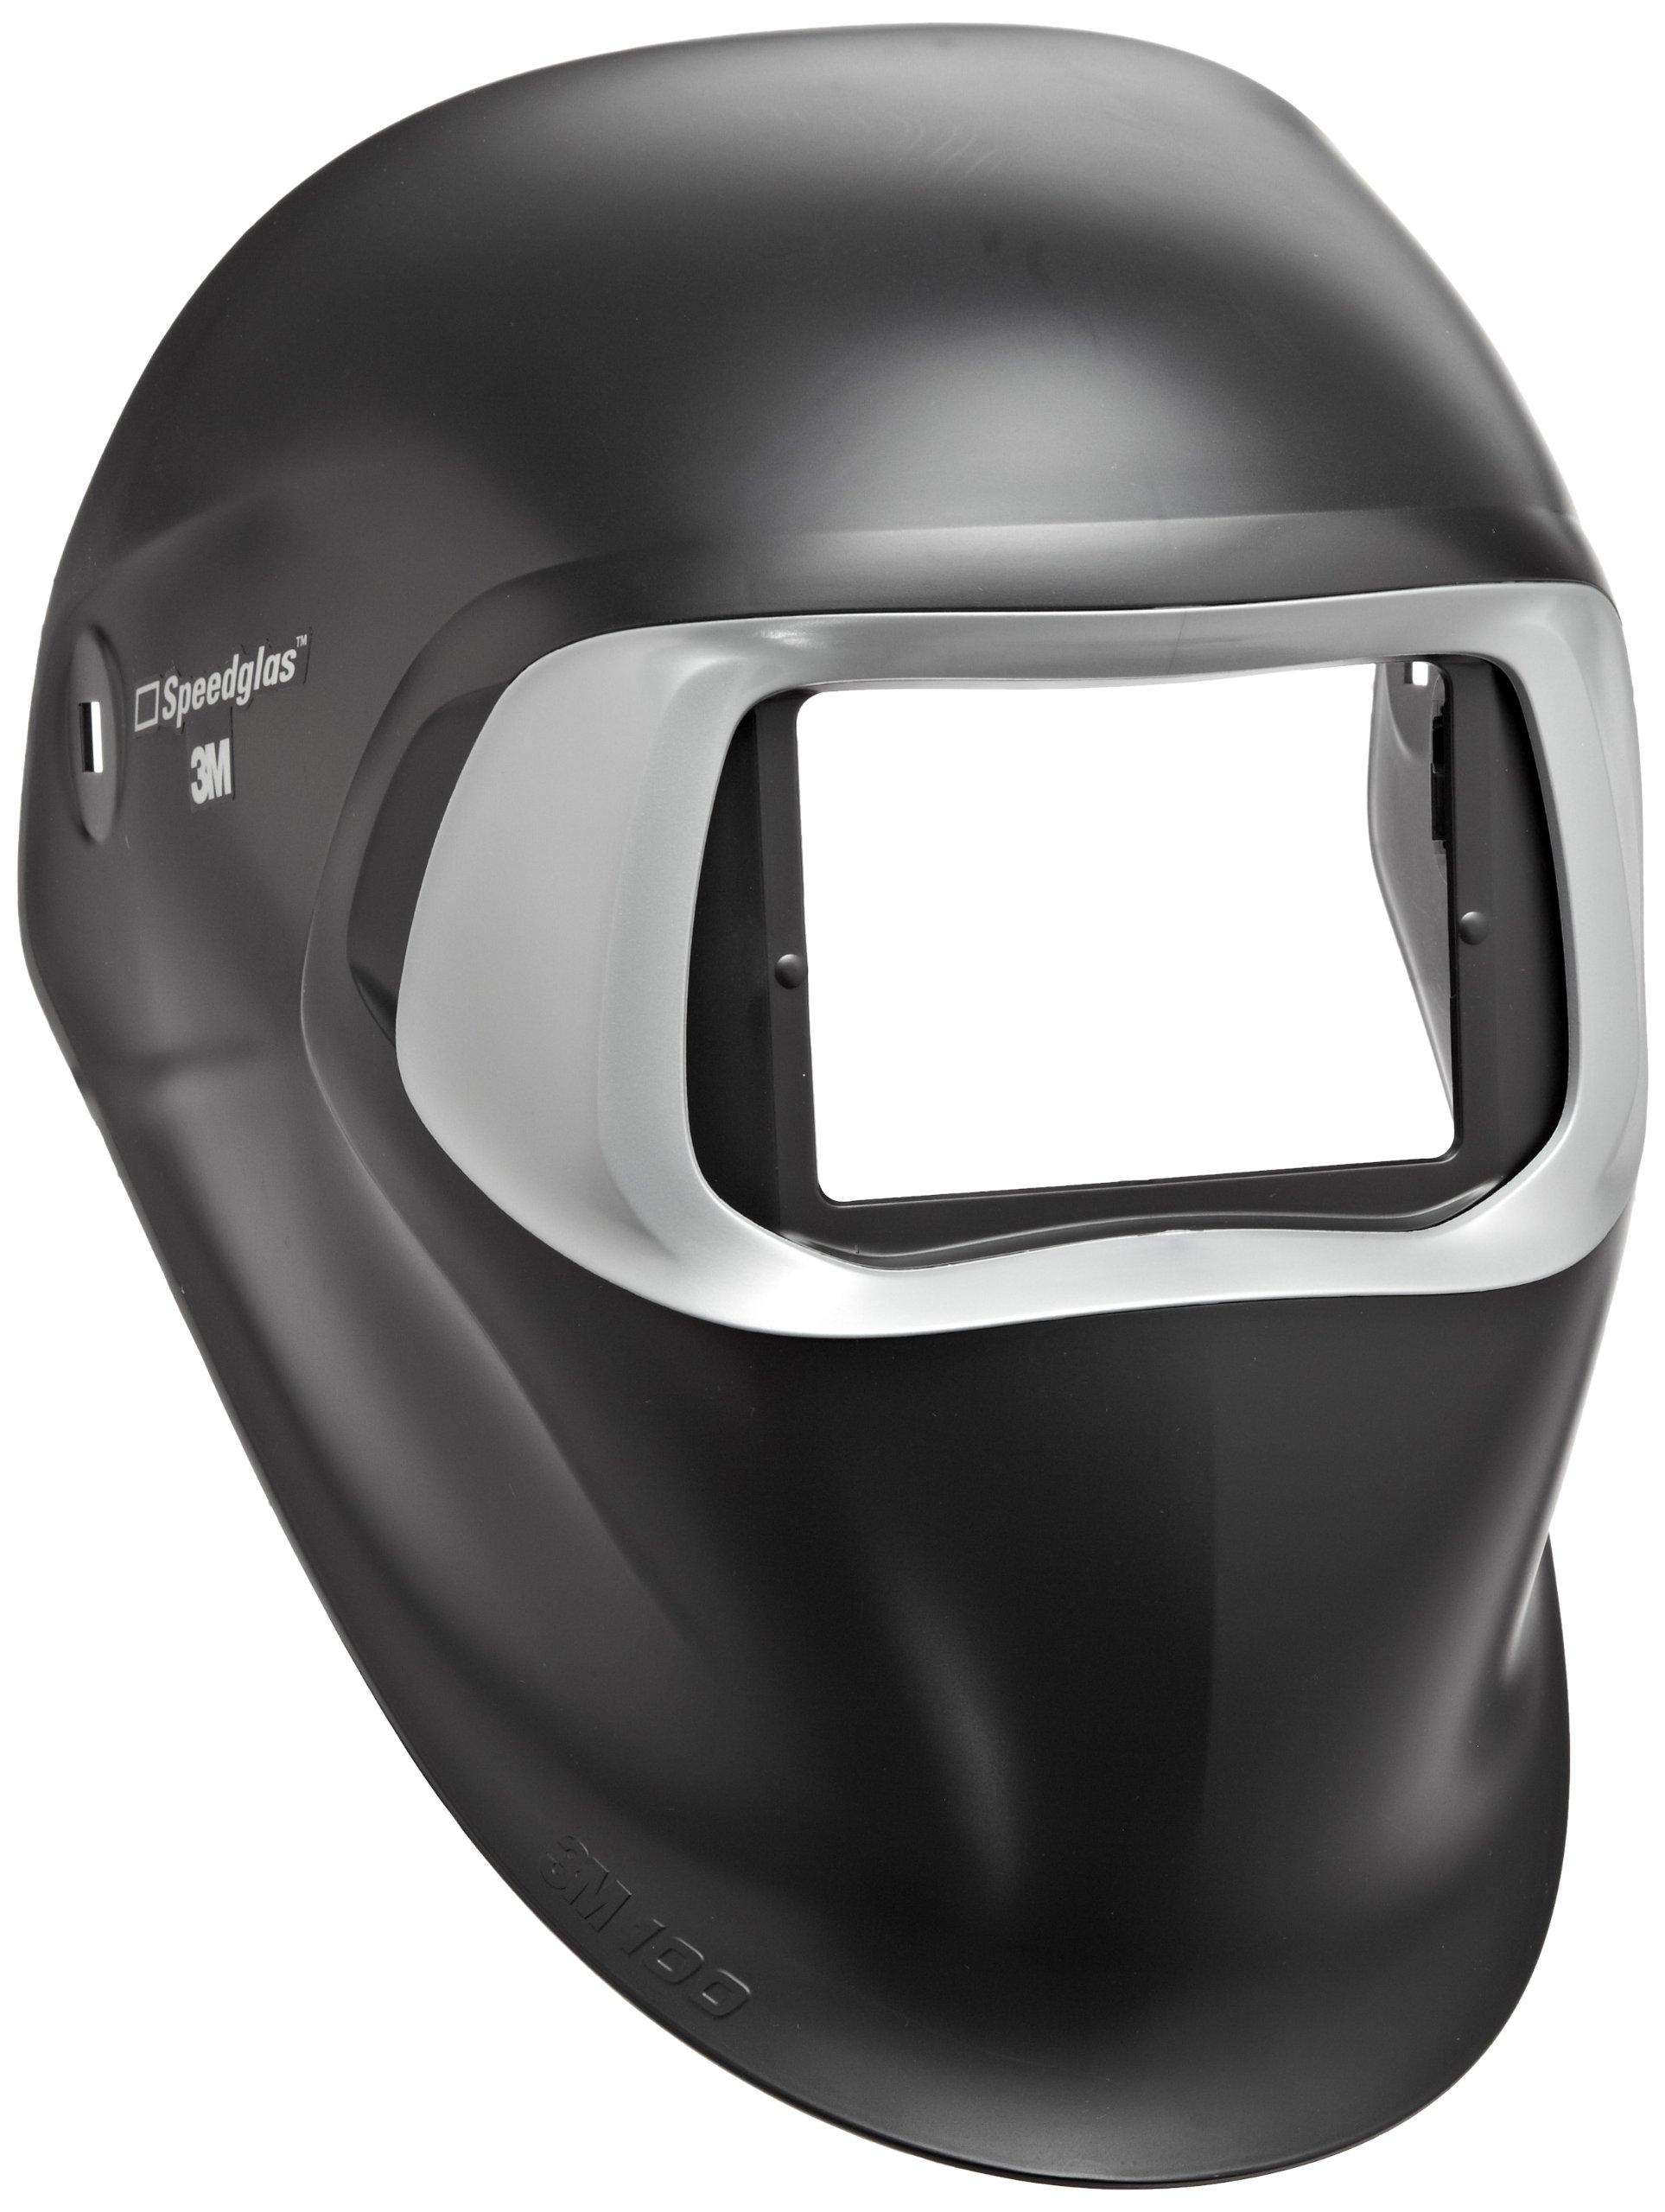 3M Speedglas Black Welding Helmet 100, Welding Safety 07-0012-00BL, without Headband and 3M Speedglas Auto-Darkening Filter by 3M Personal Protective Equipment (Image #1)